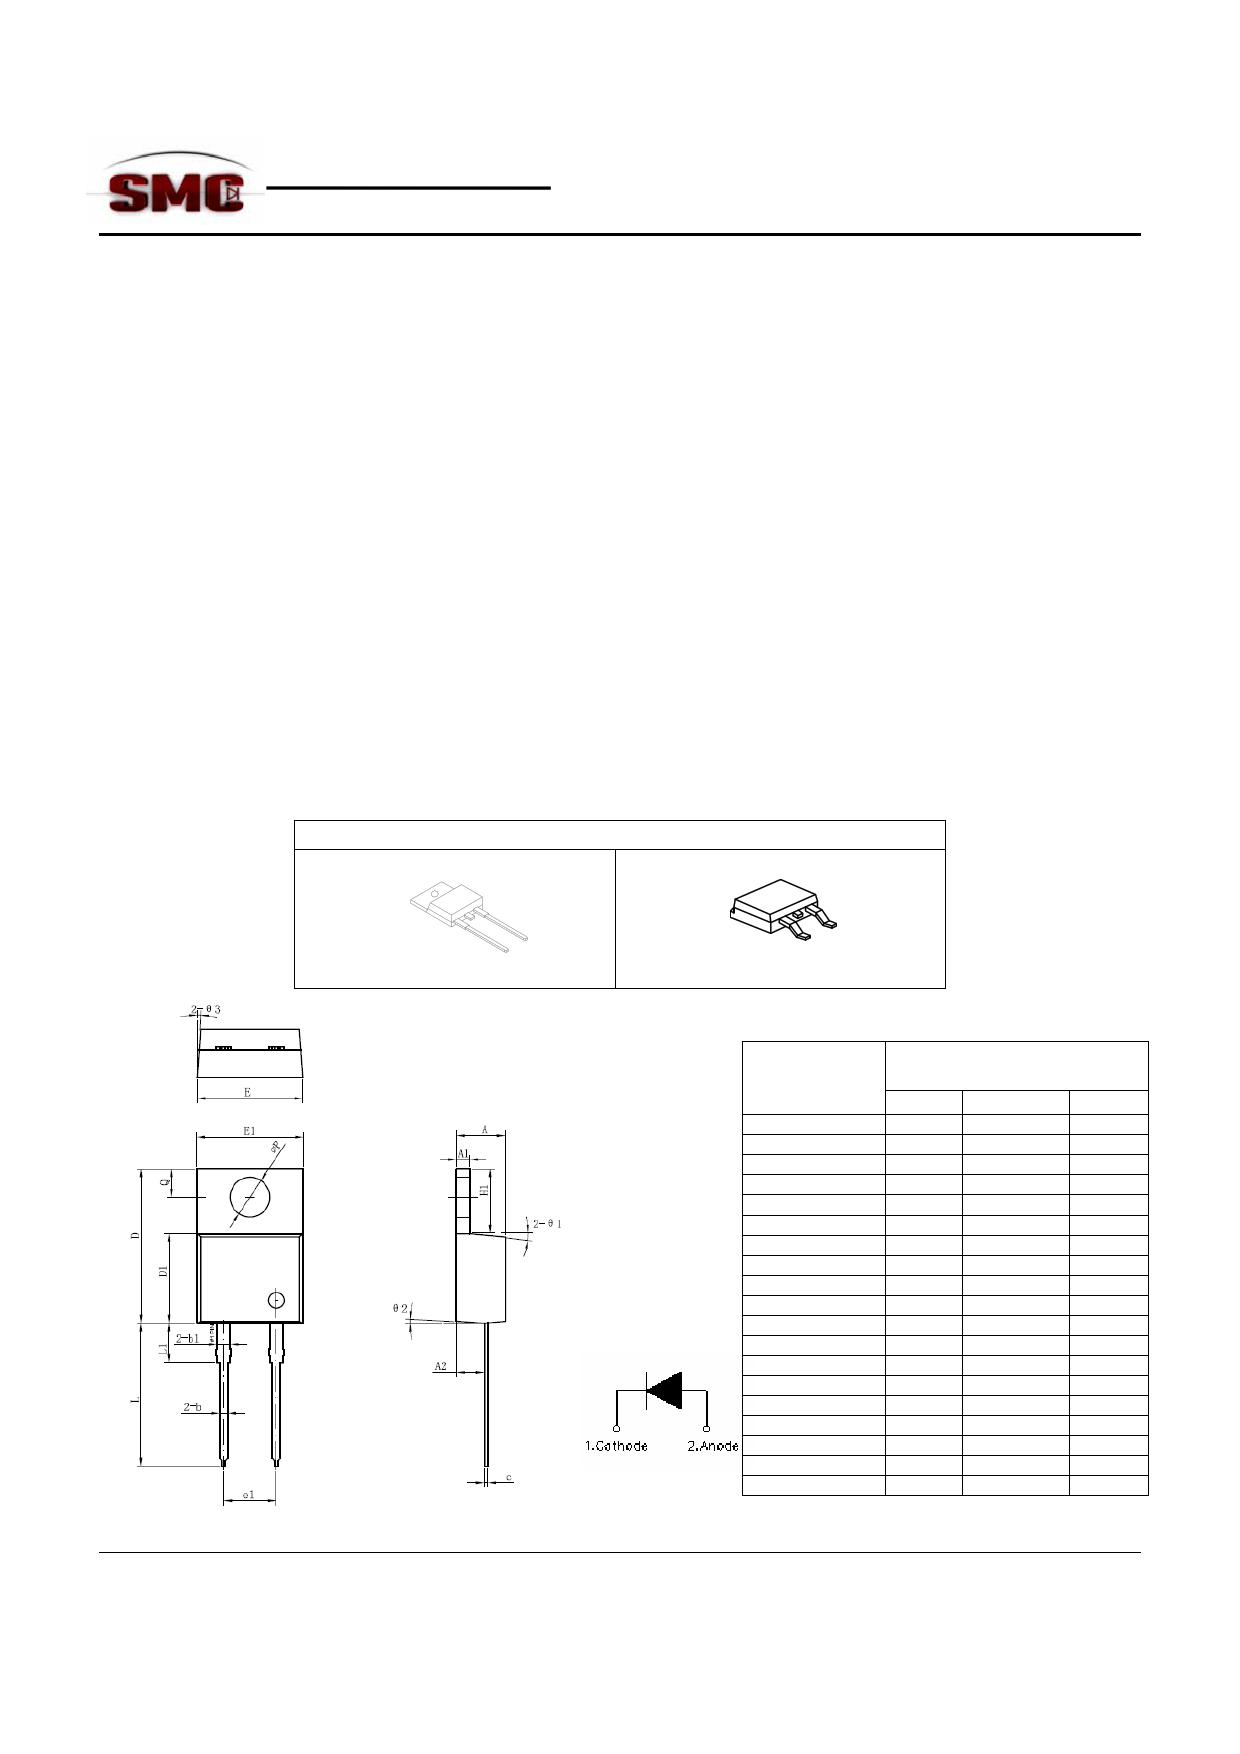 10TQ045 Datasheet, 10TQ045 PDF,ピン配置, 機能